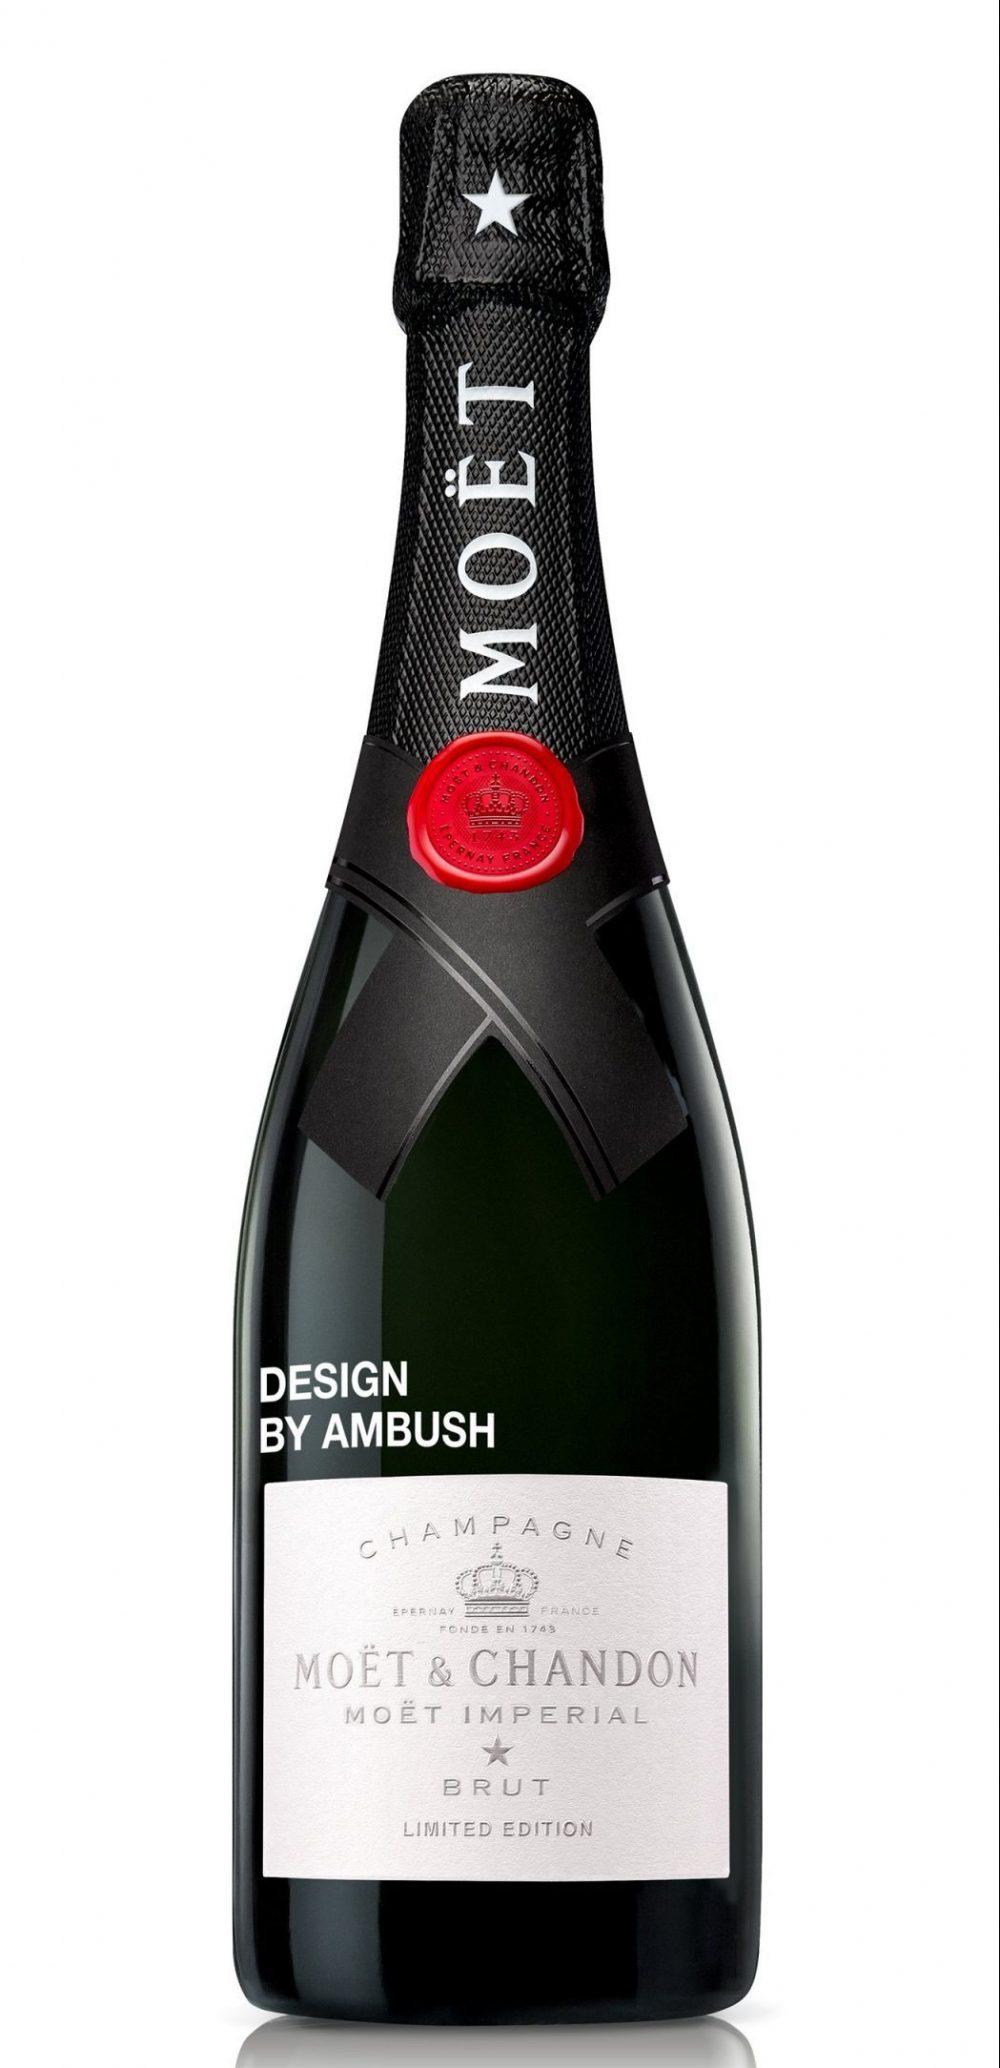 Moët & Chandon x AMBUSH Limited Edition